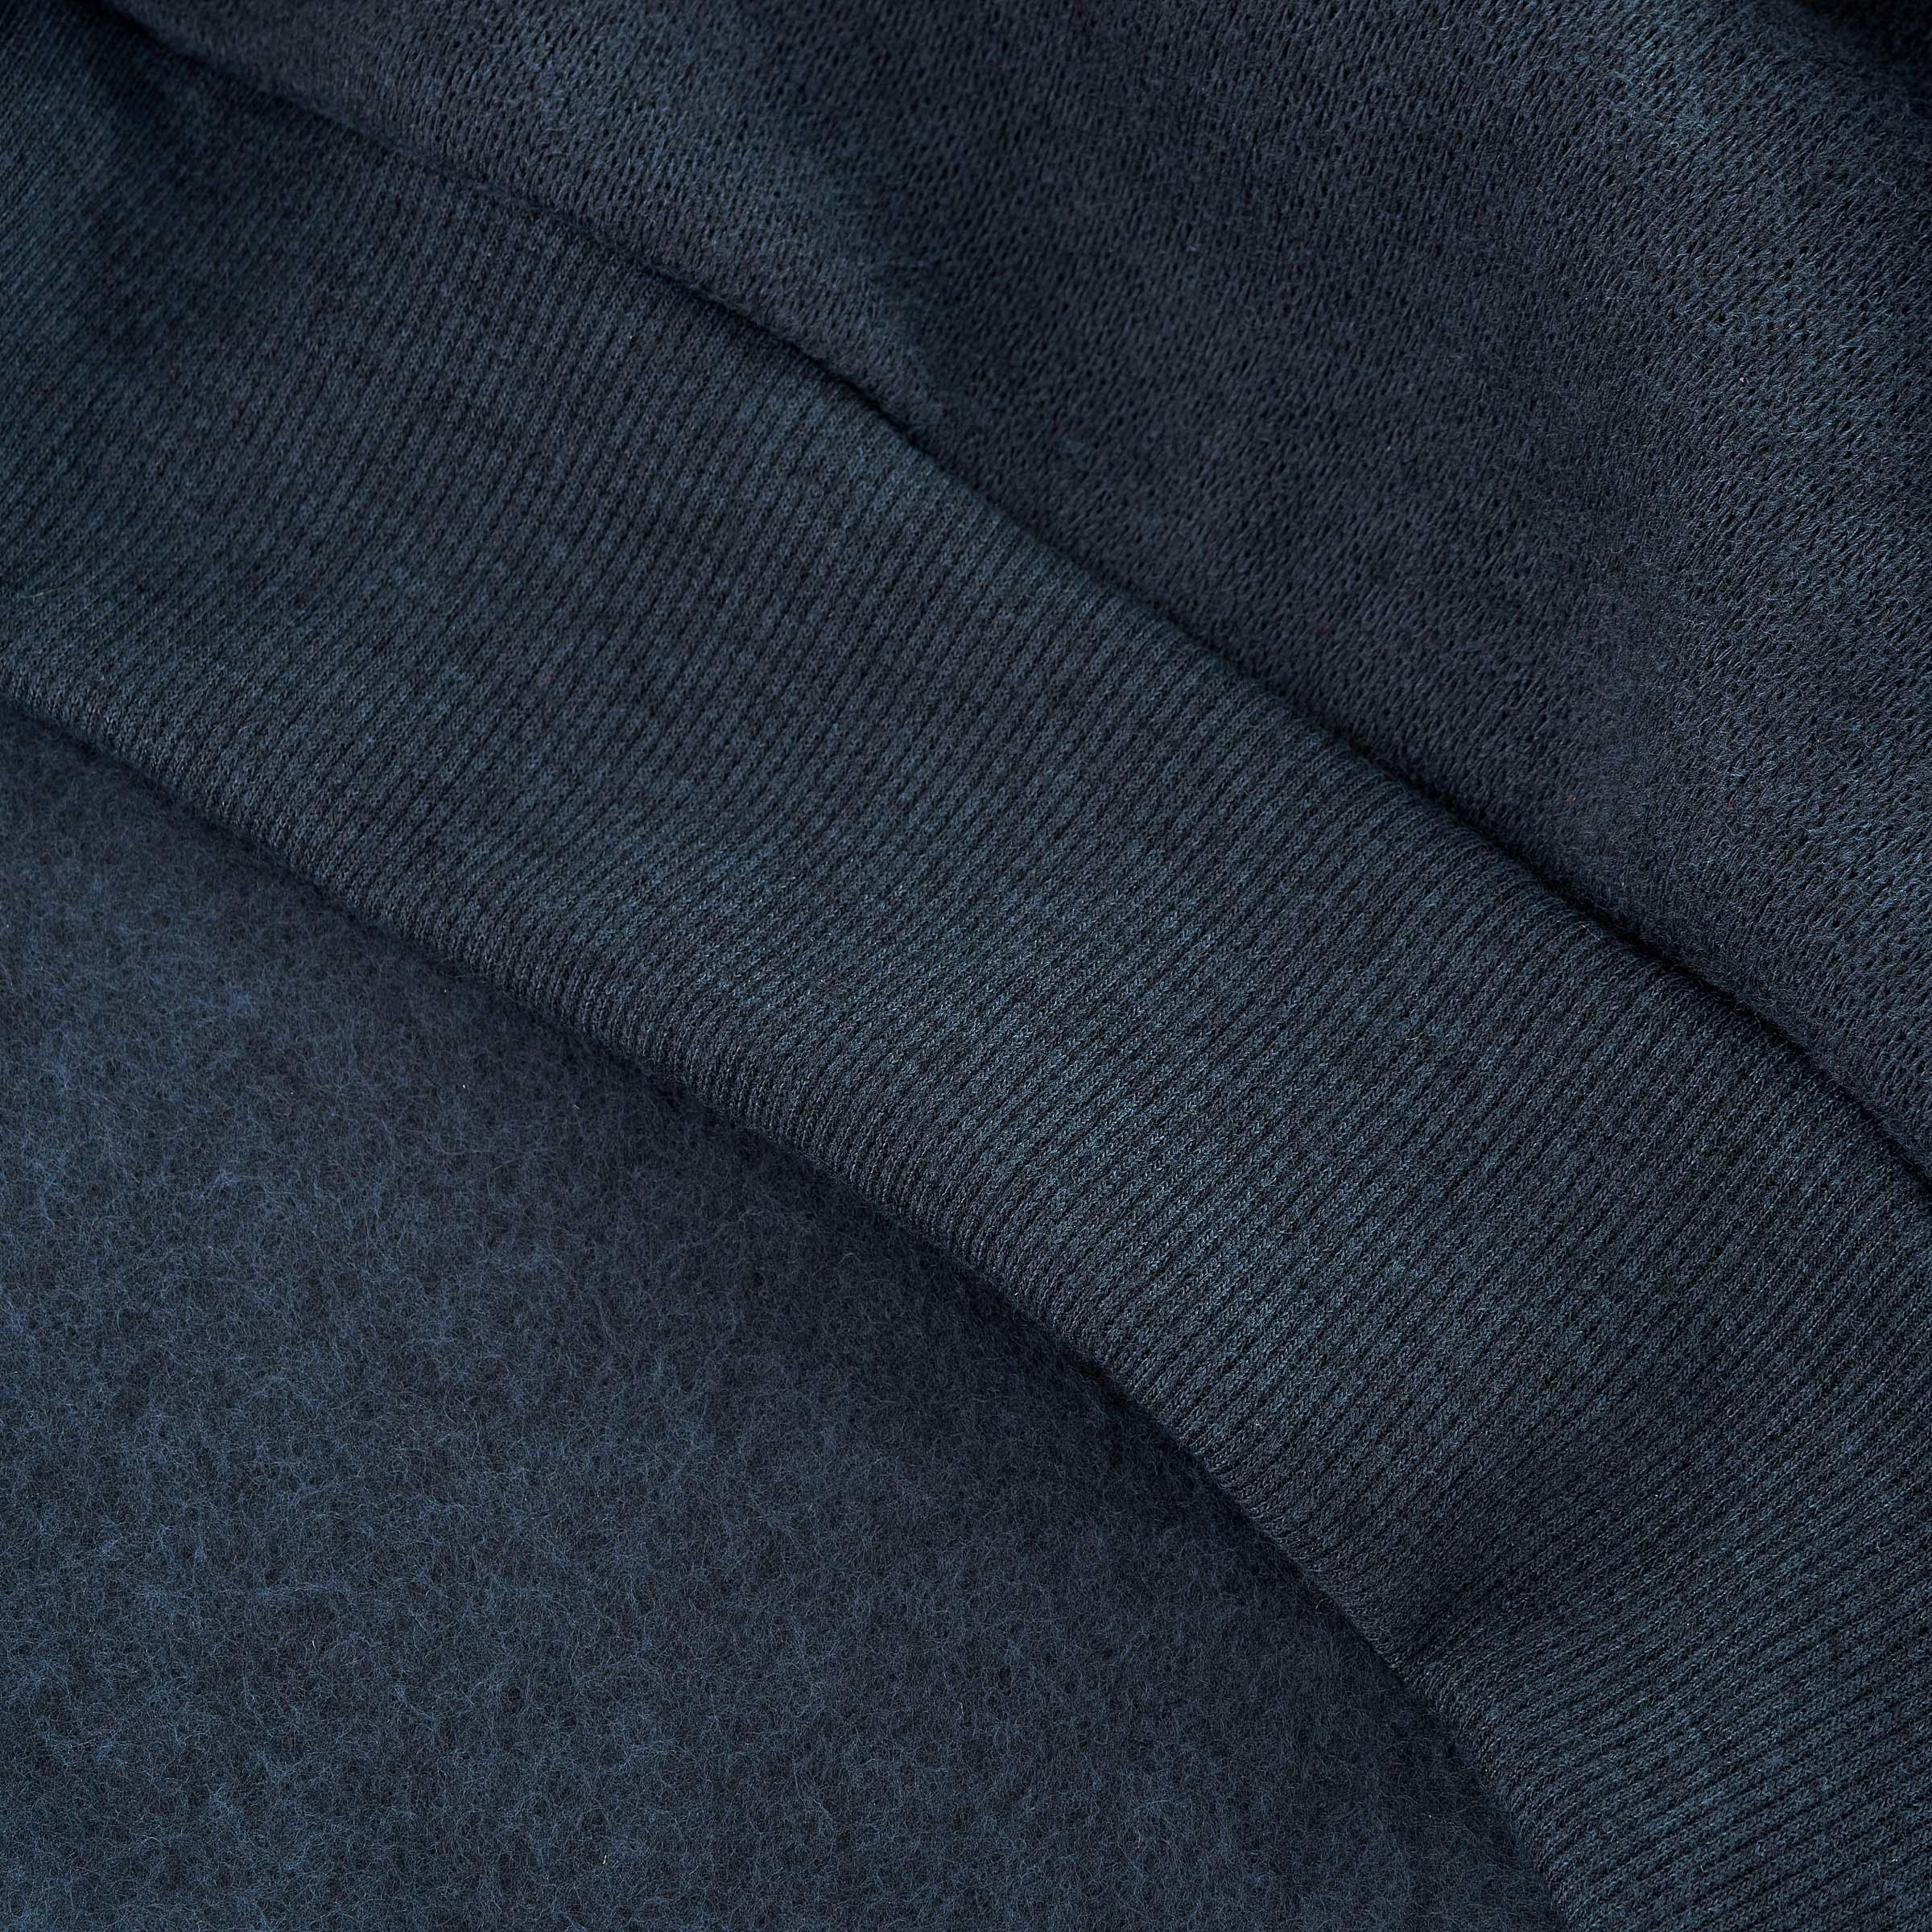 Chandail de randonnée nature homme NH150 bleu marine